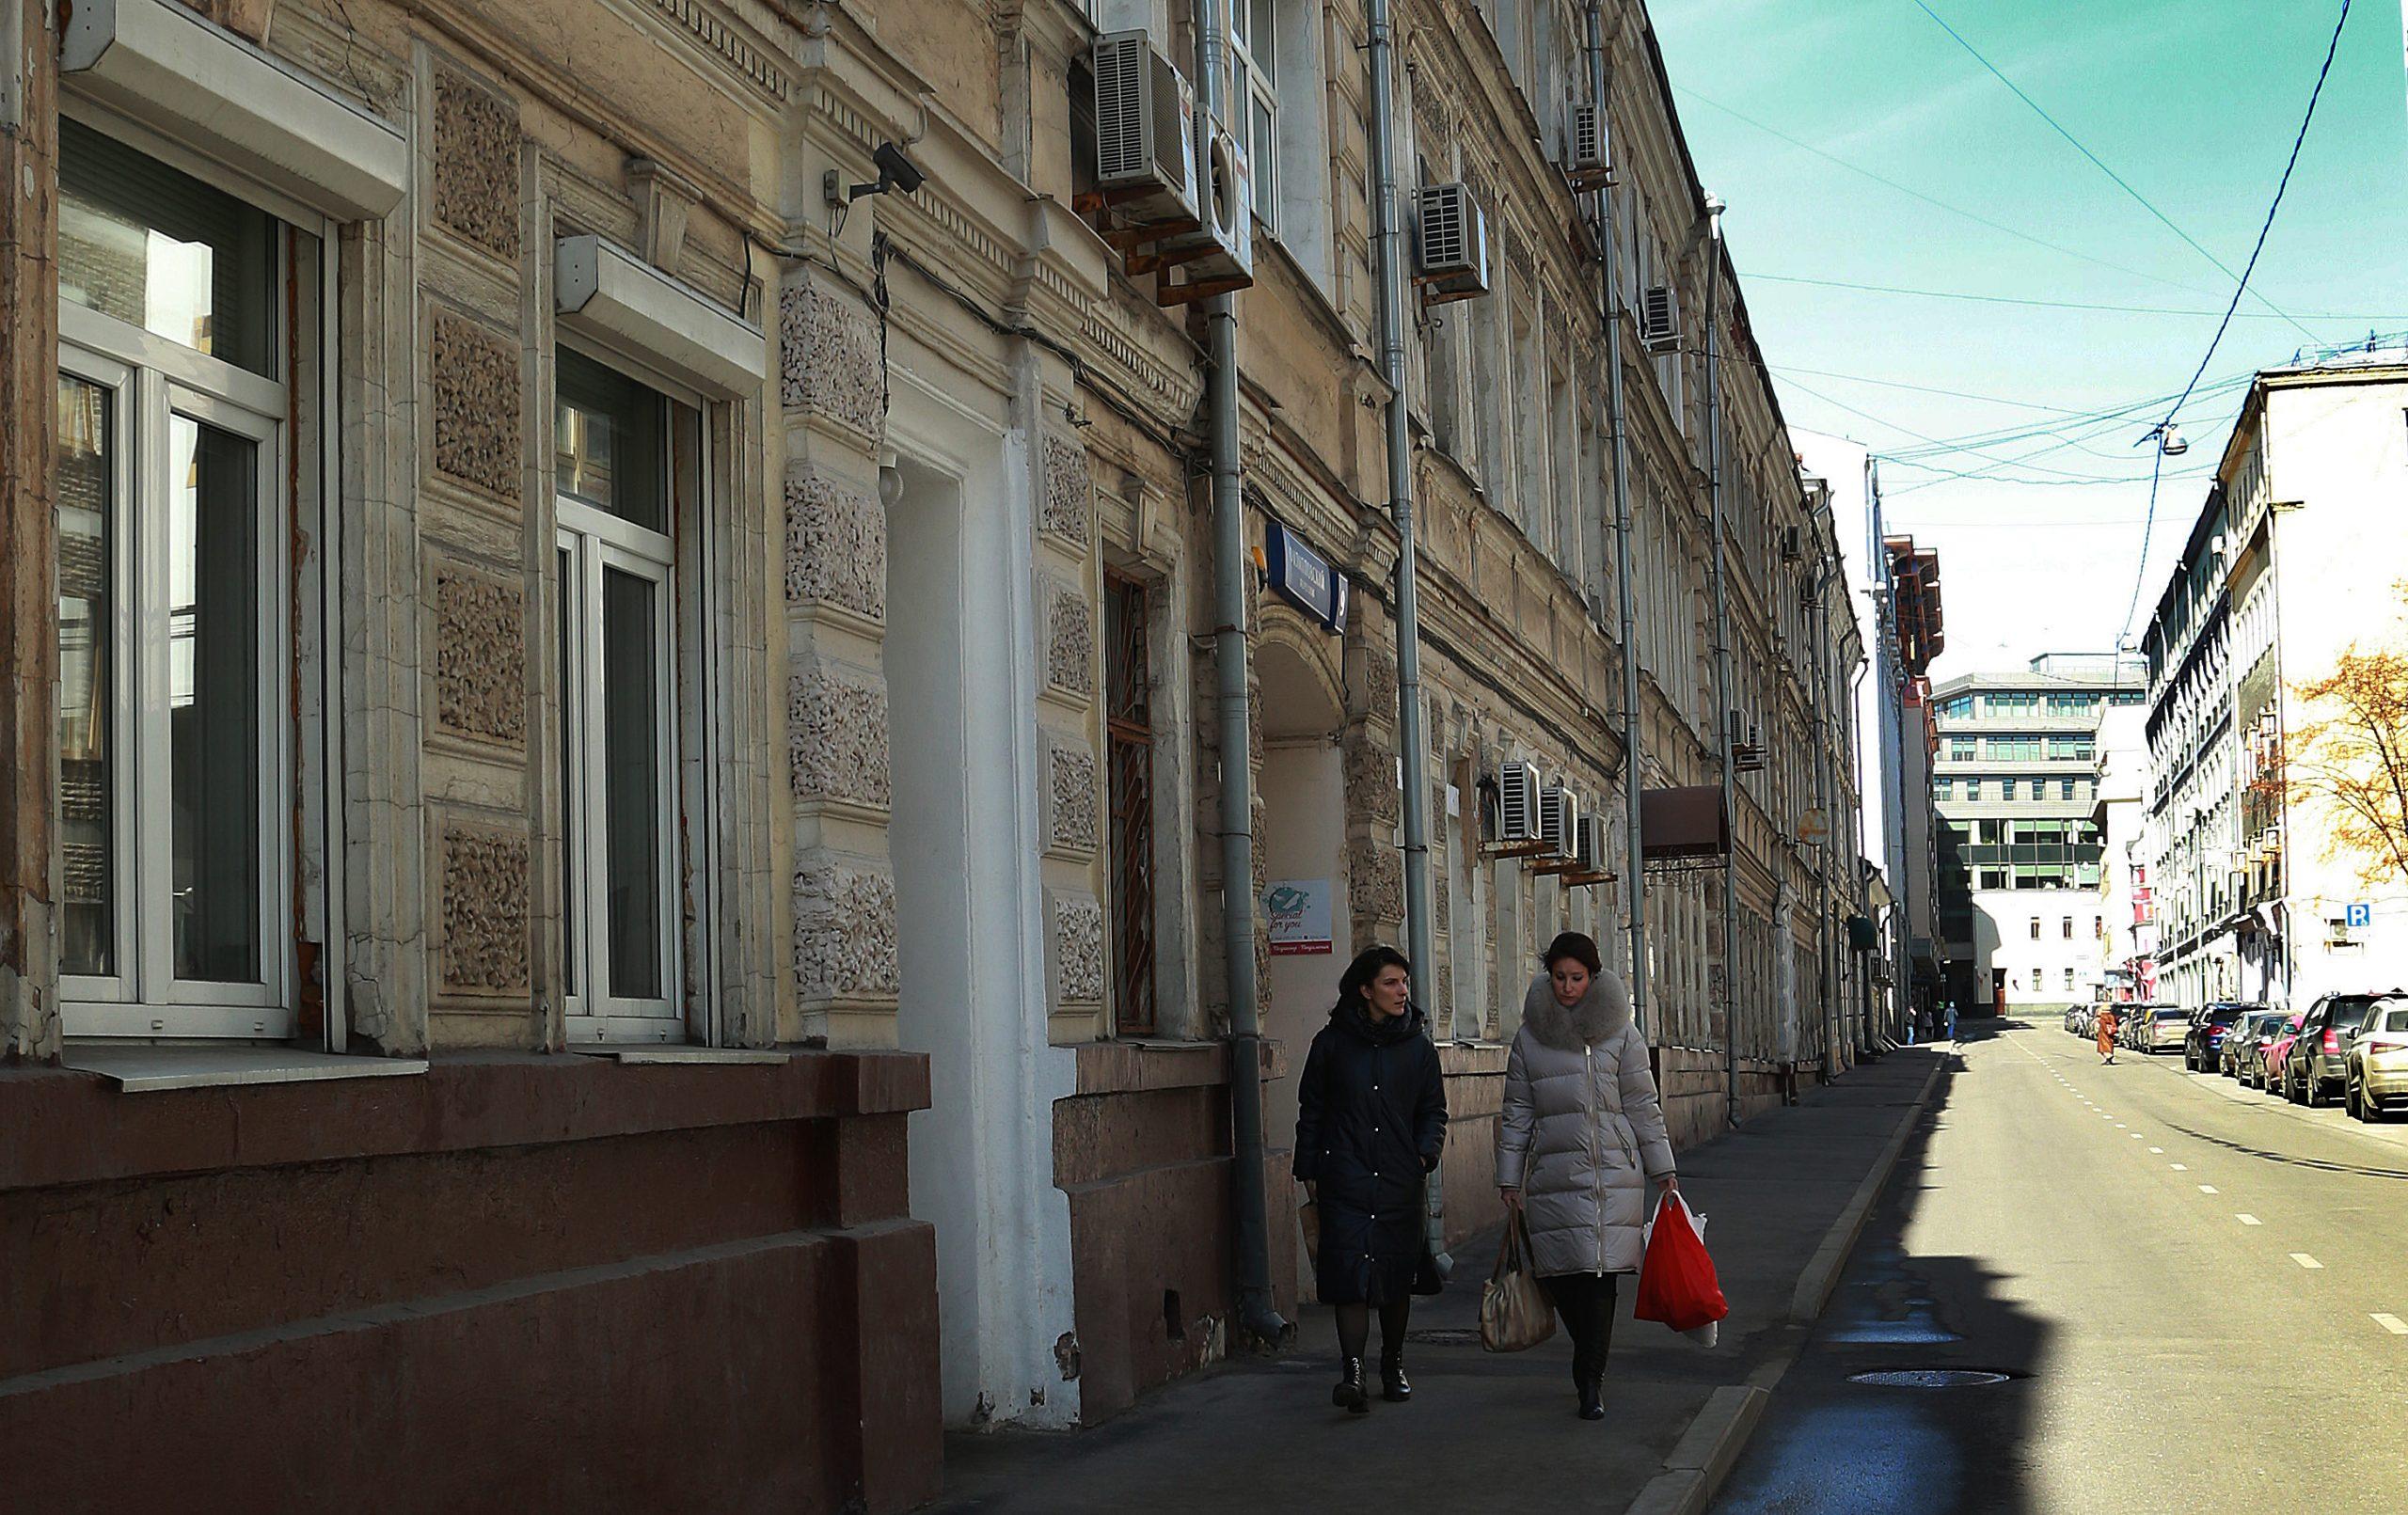 Дом No 9 в Филипповском в наши дни. Фото: Наталия Нечаева, Вечерняя Москва